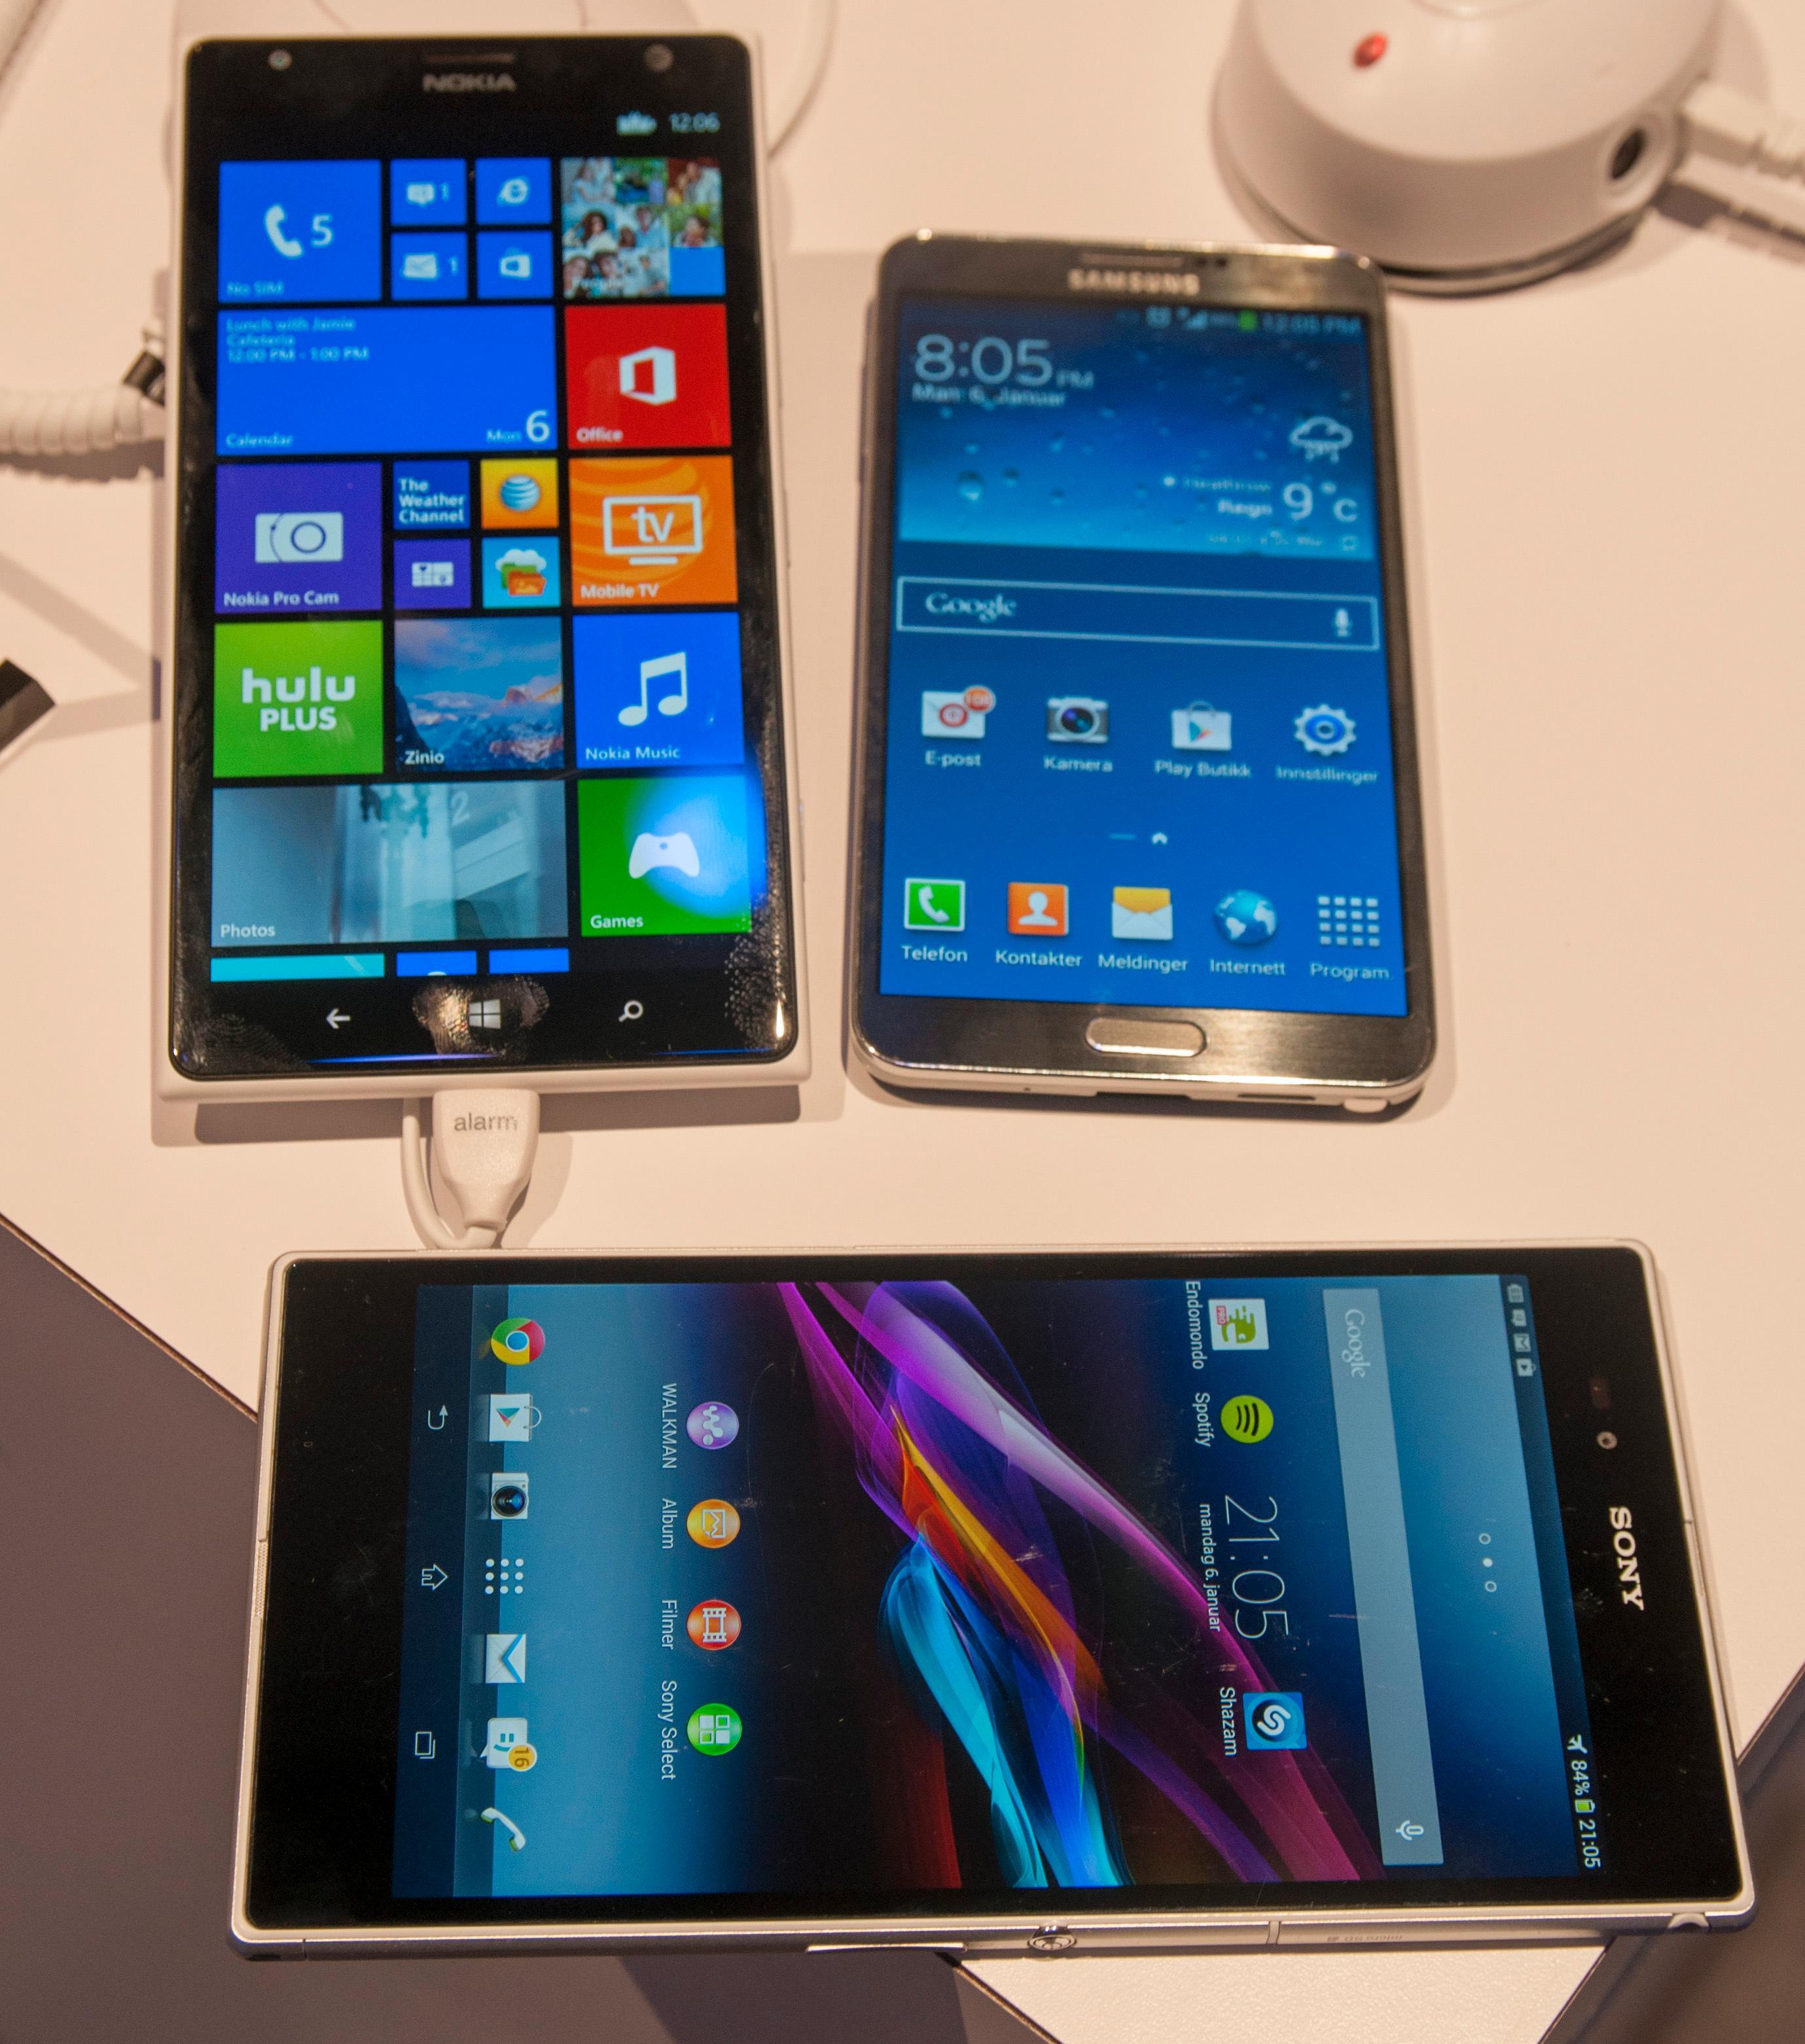 Lumia 1520 er en relativt voksen sak. Her er den avbildet sammen med Samsung Galaxy Note 3 og Sony Xperia Z Ultra.Foto: Finn Jarle Kvalheim, Amobil.no